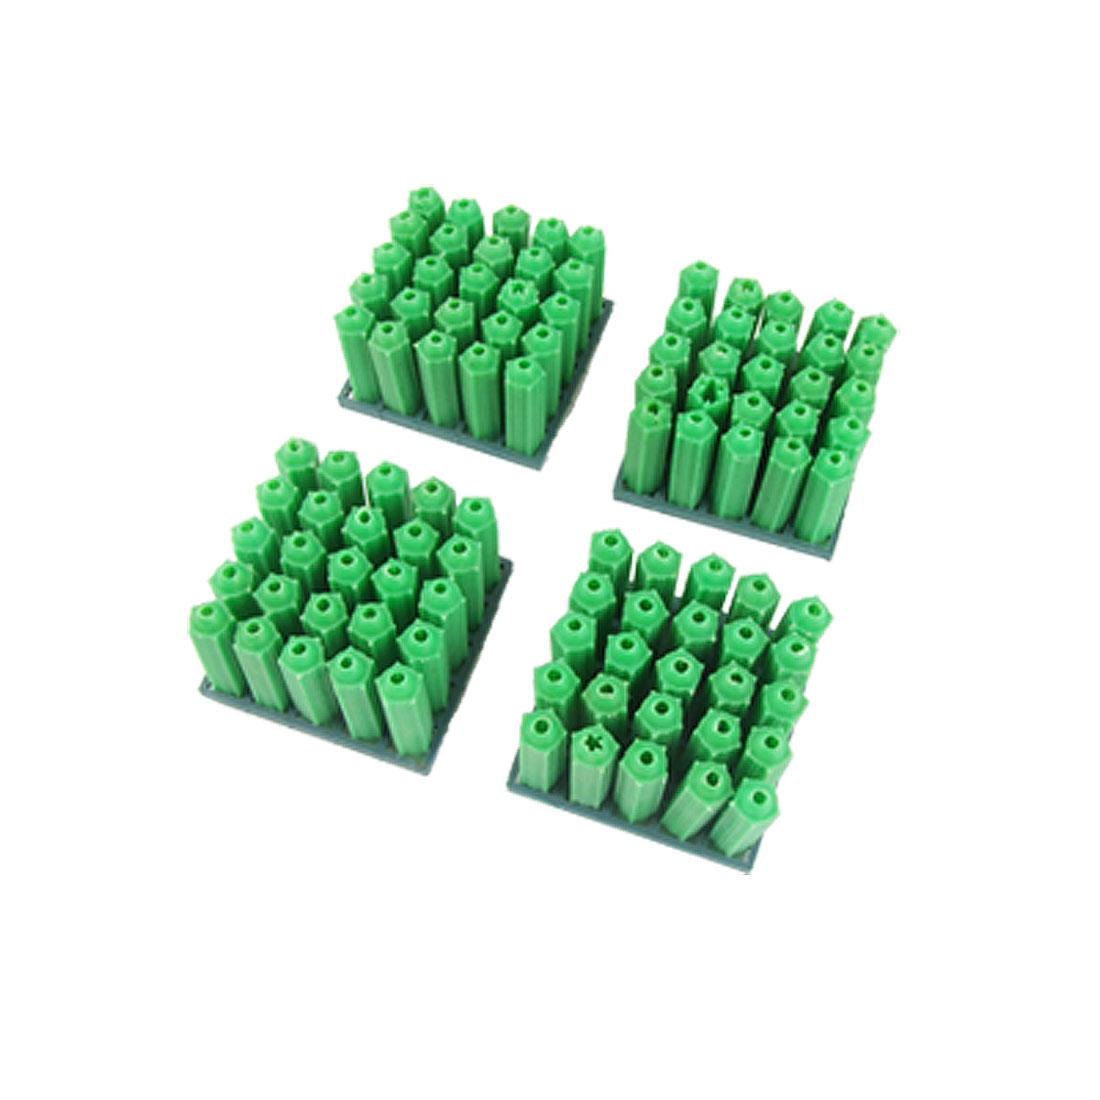 100 Pcs Green 8mm Plastic Screw Fixing Wall Connector Tool